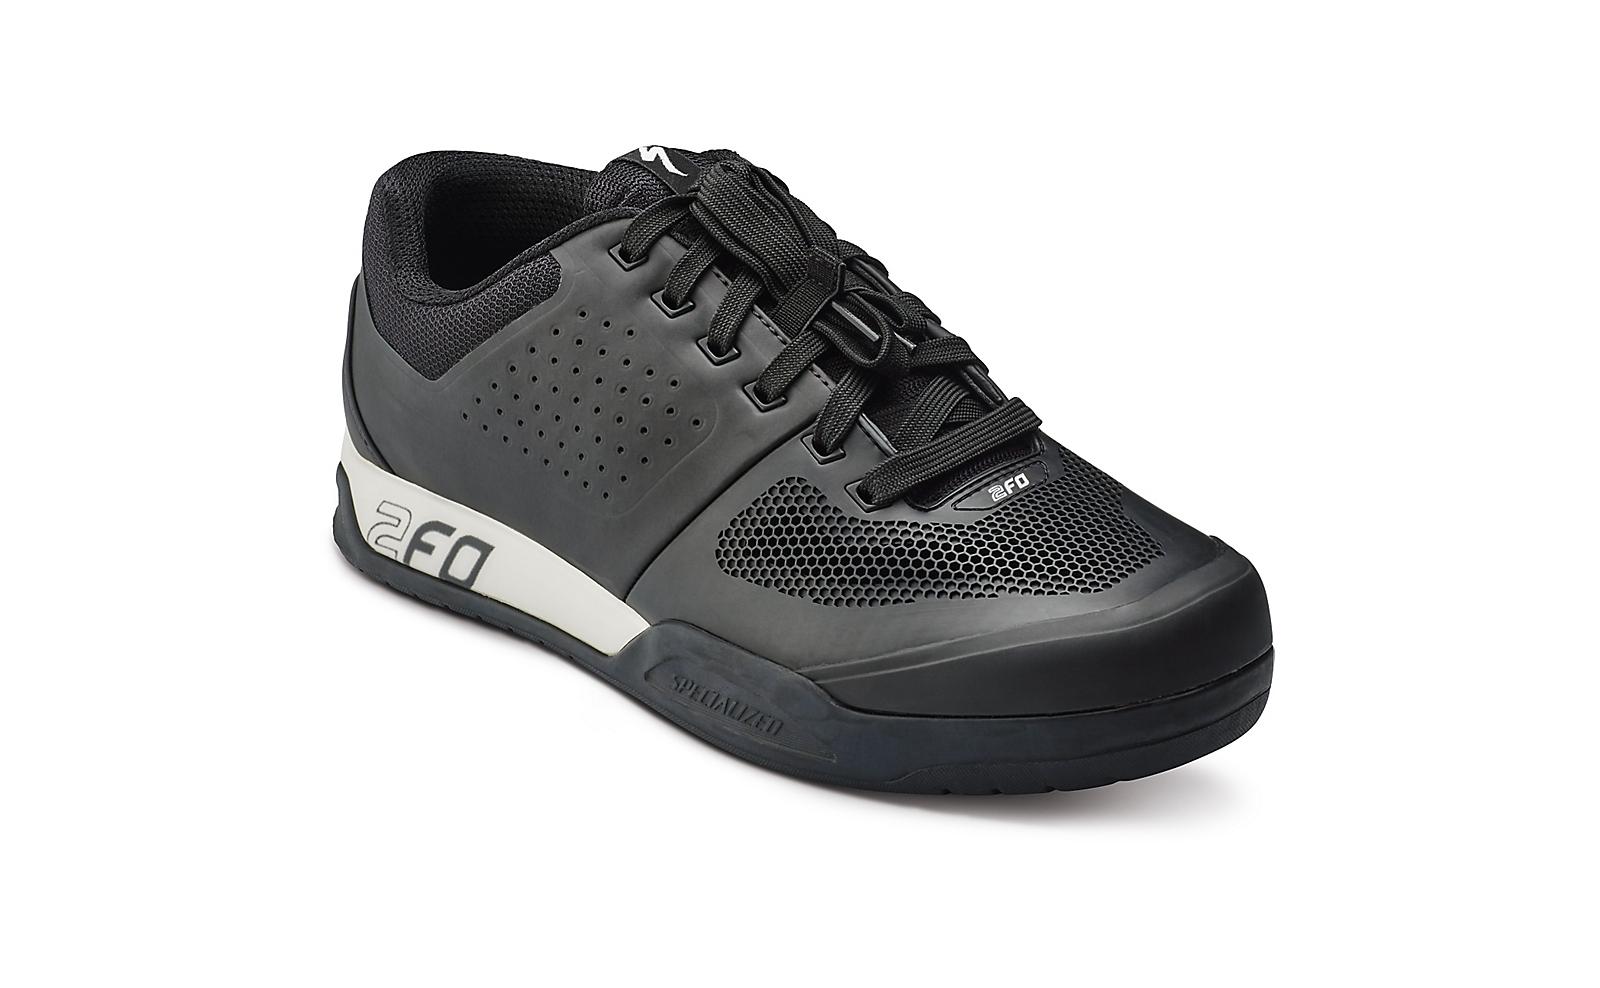 Specialized Schuhe 2FO Flat MTBl